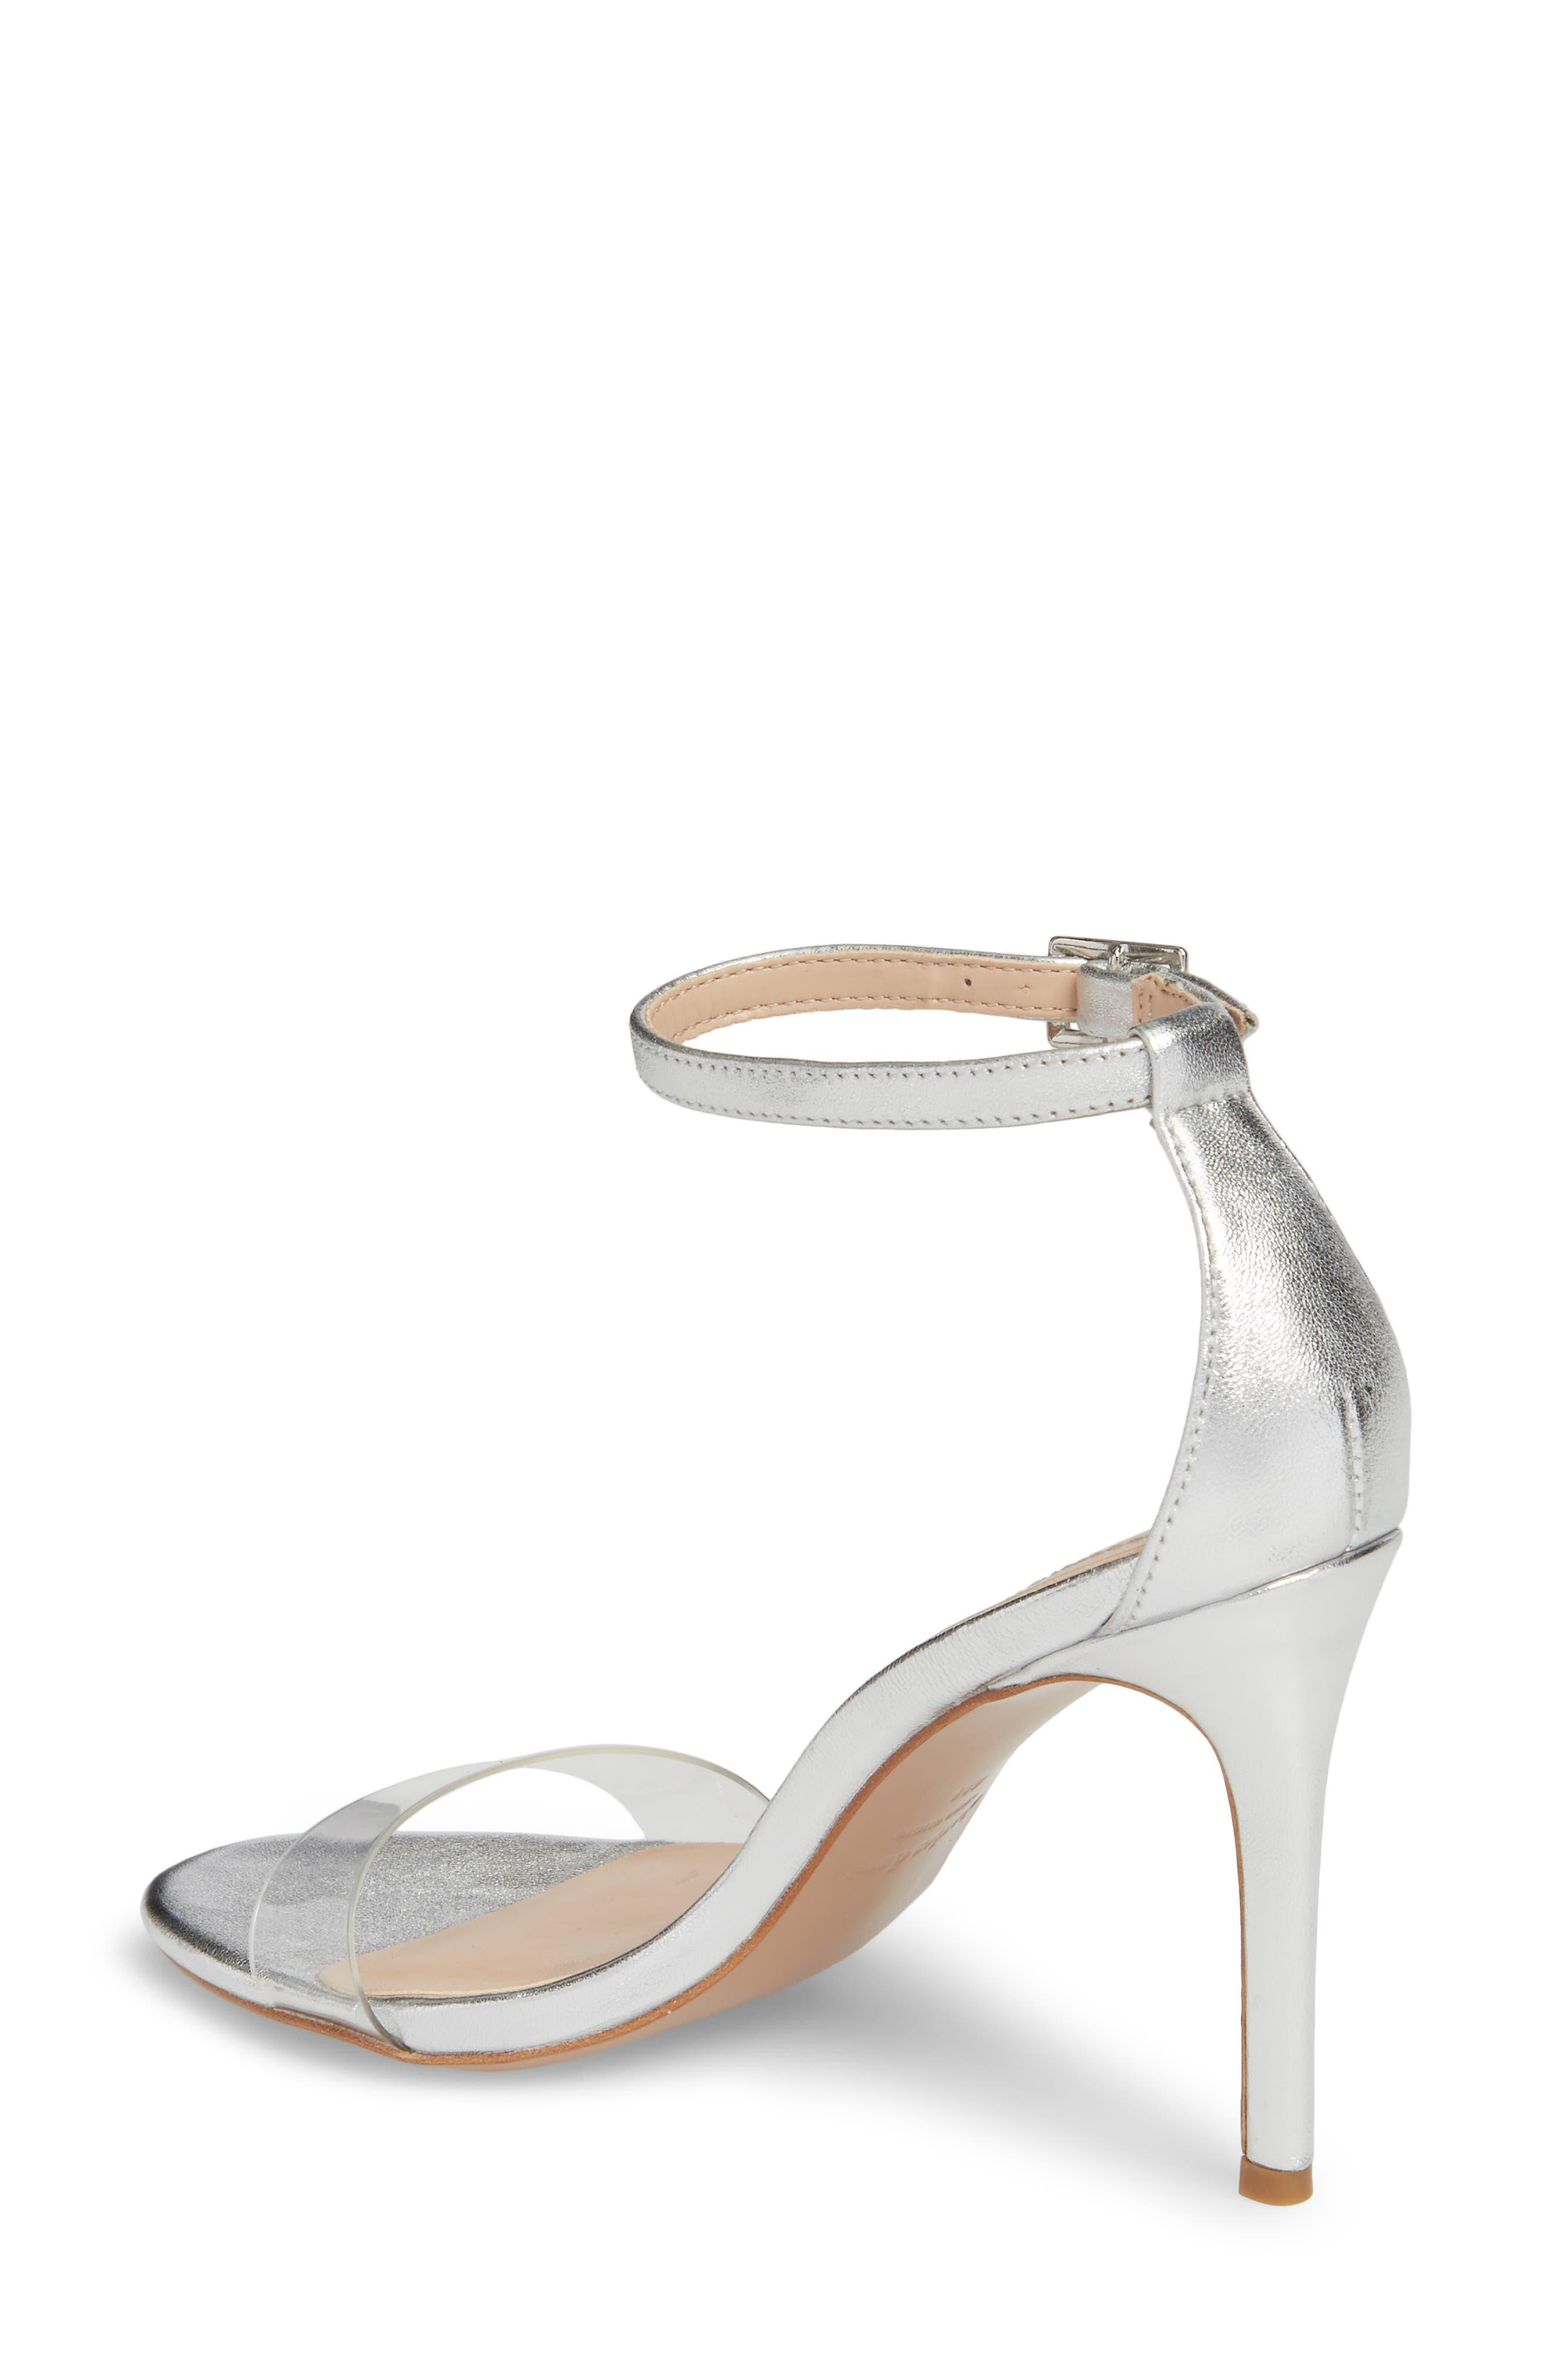 Cristal Sandal,                             Alternate thumbnail 2, color,                             Silver Metallic Leather